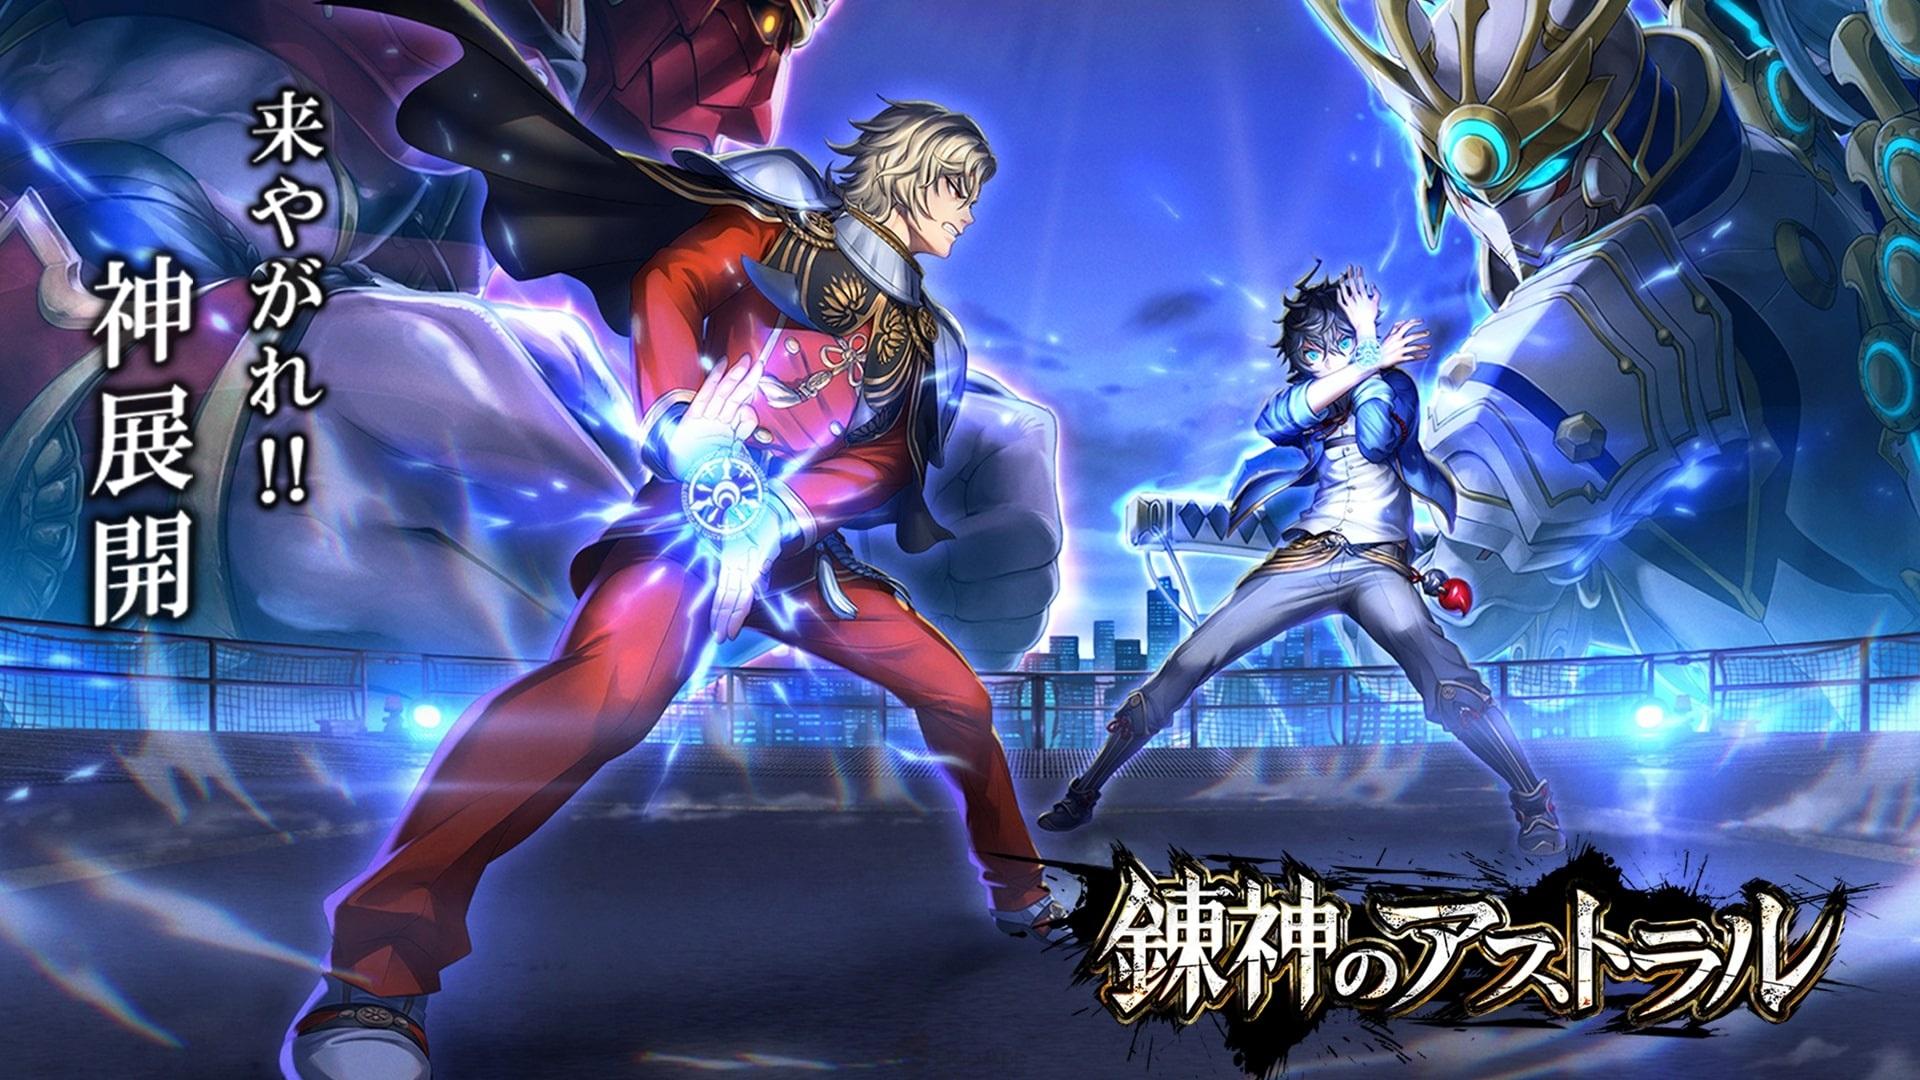 NC JAPAN 策略遊戲新作《鍊神之星》開展事前登錄活動 宣傳影片同步釋出